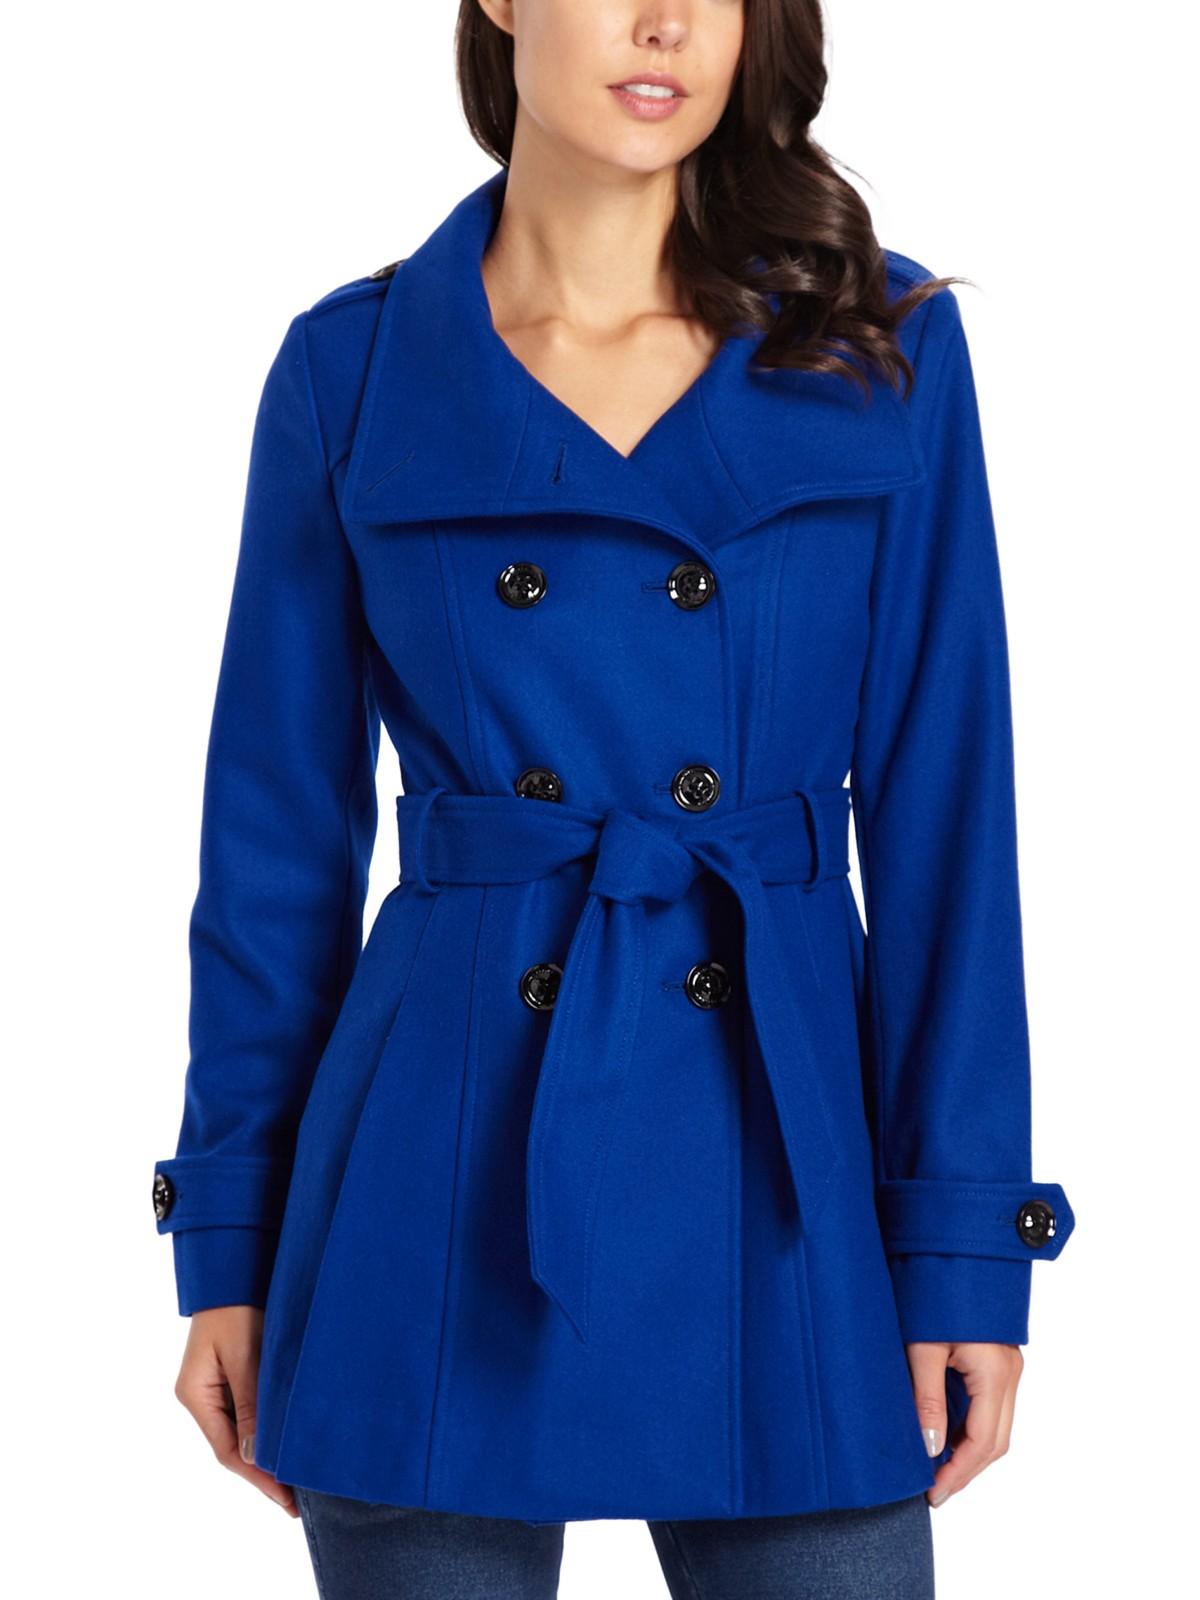 Guess Aubrey Wool Trench Coat Ebay